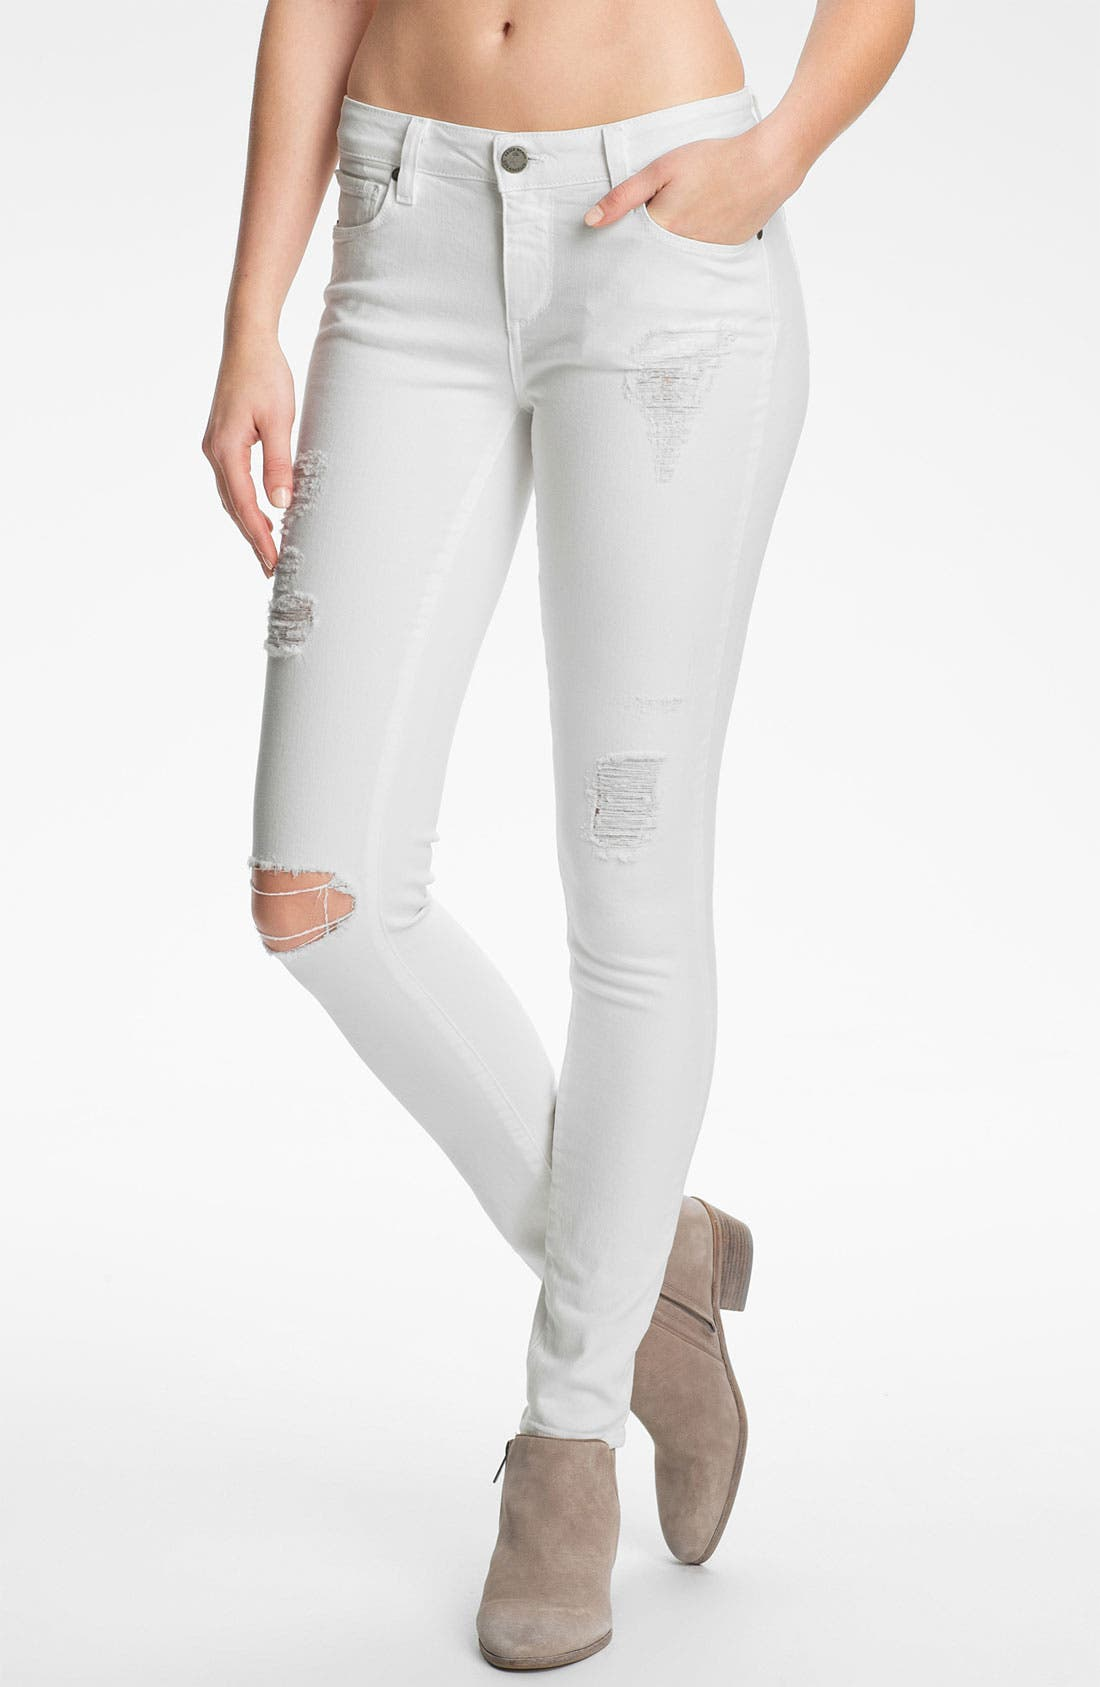 Main Image - PAIGE 'Verdugo' Destroyed Ultra Skinny Jeans (Optic White Deconstruction)